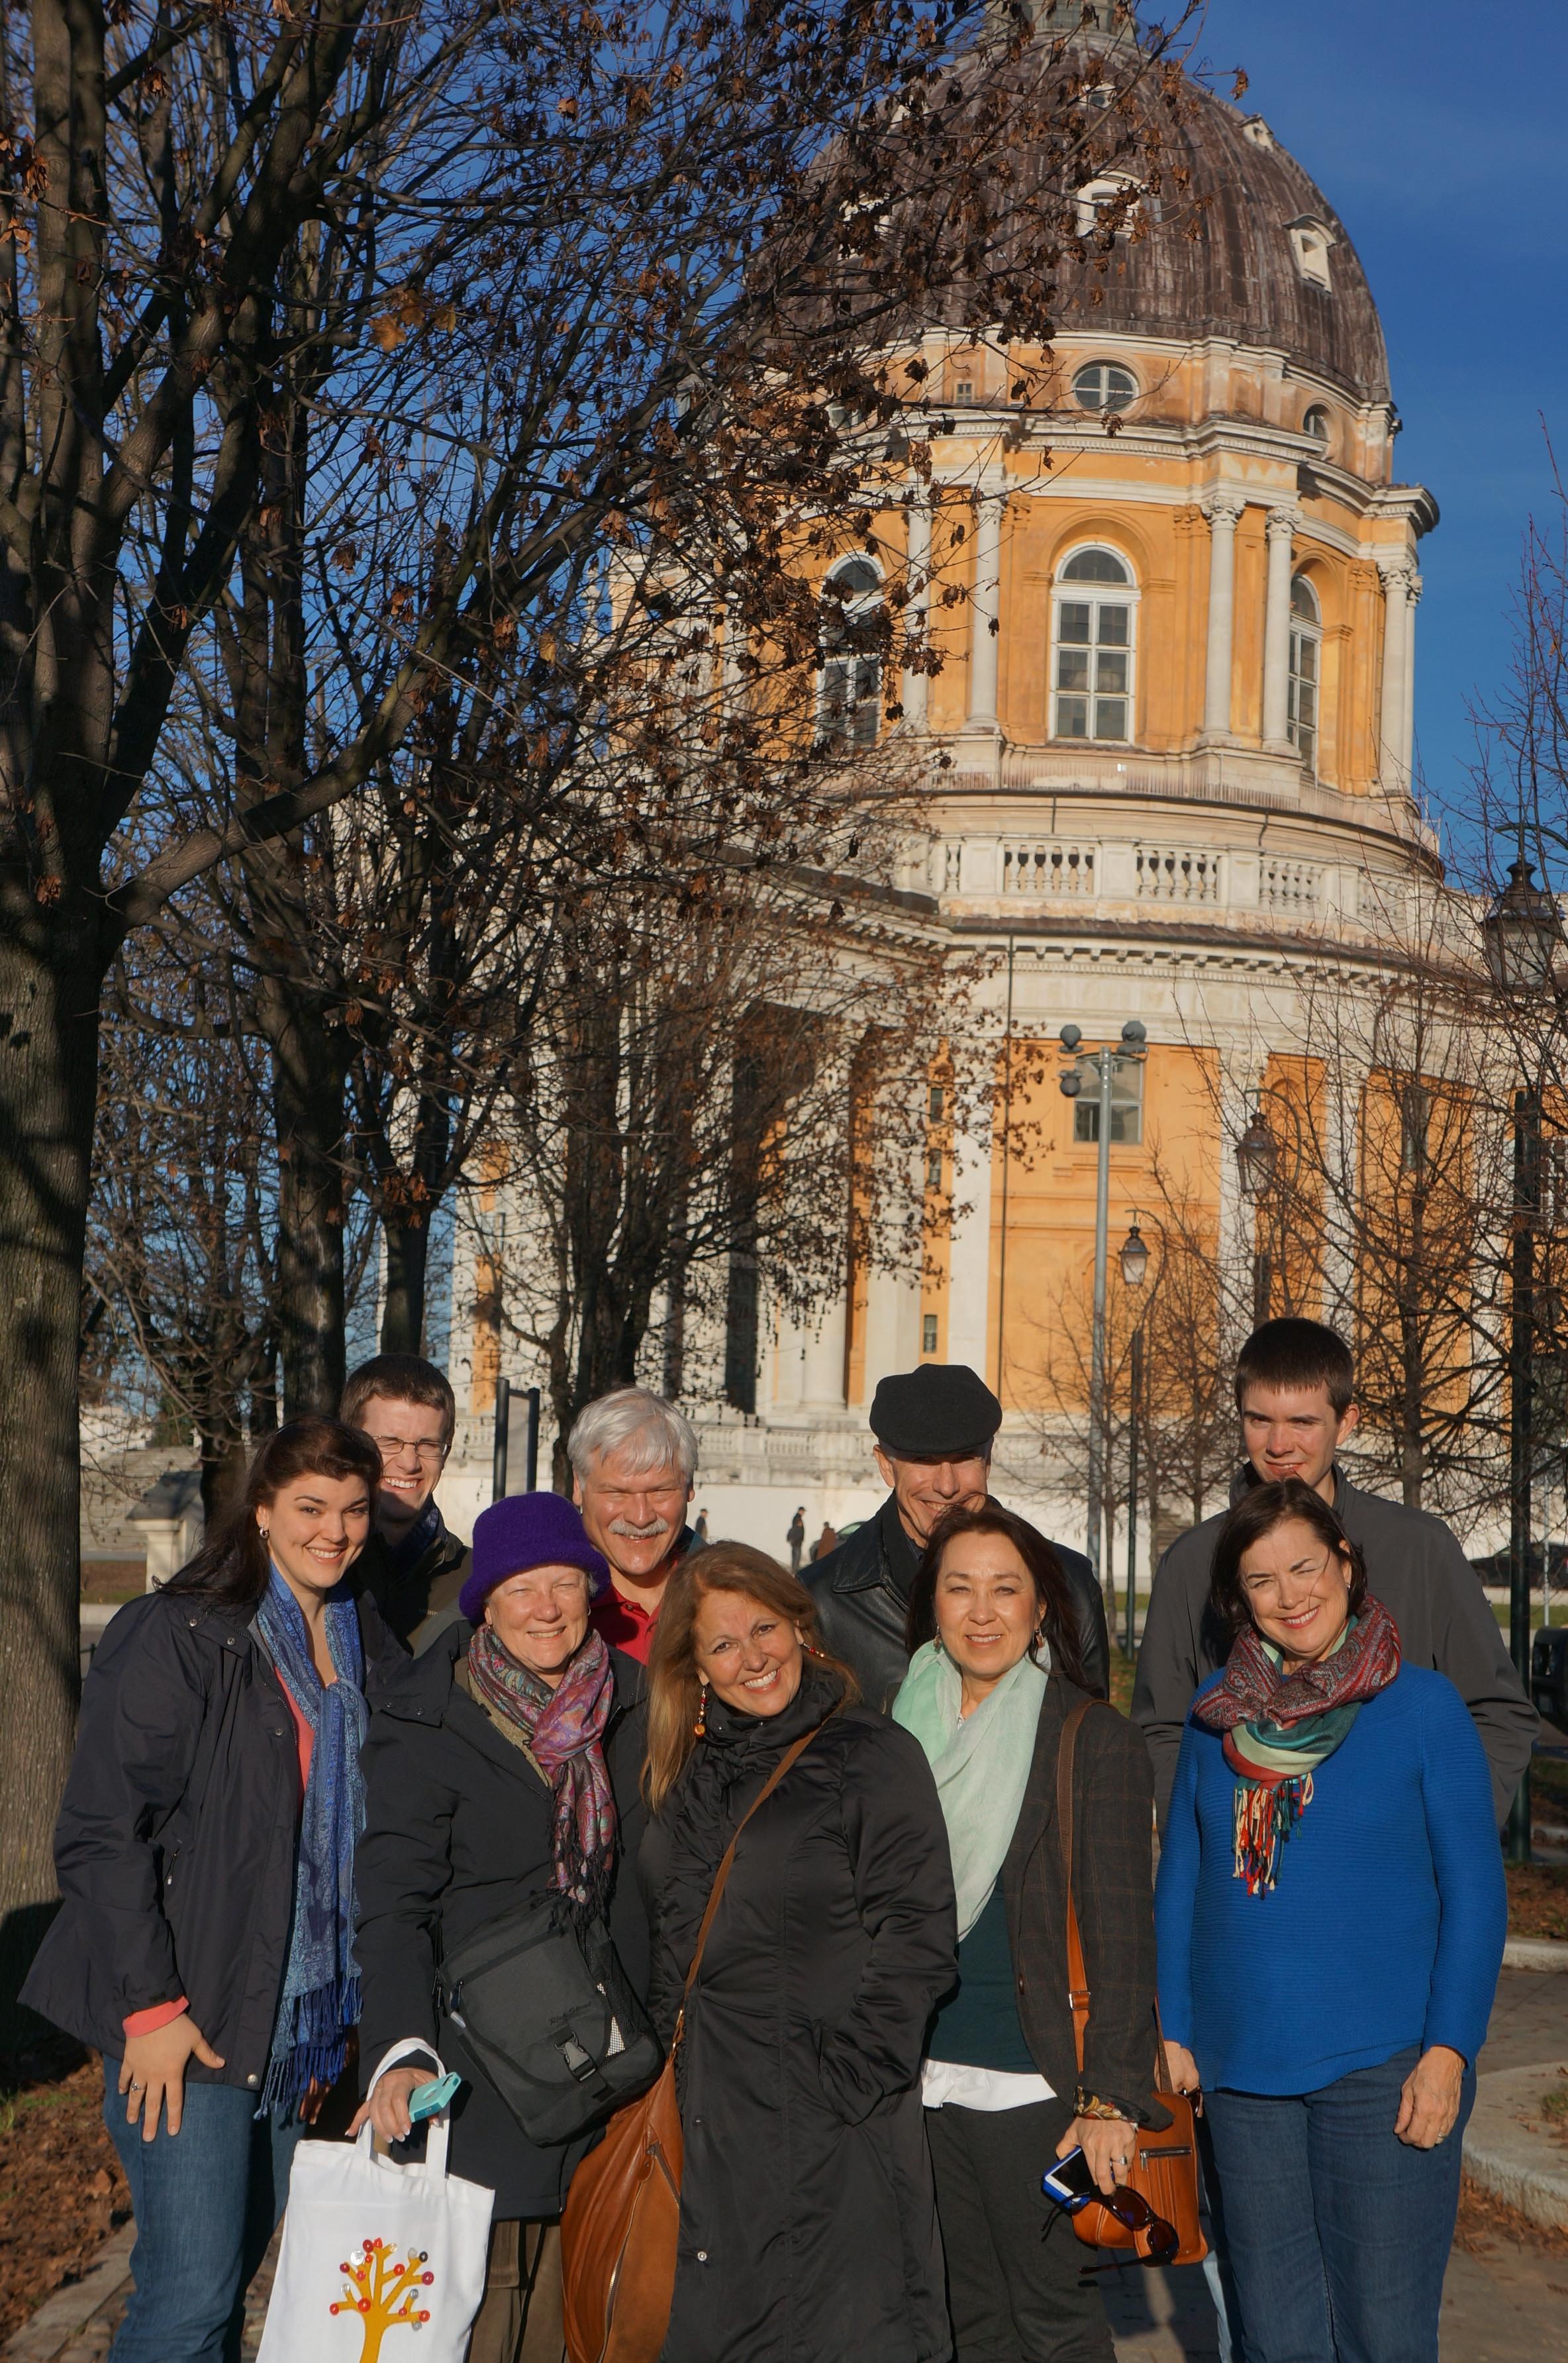 The team visits the Roman Catholic church at Superga